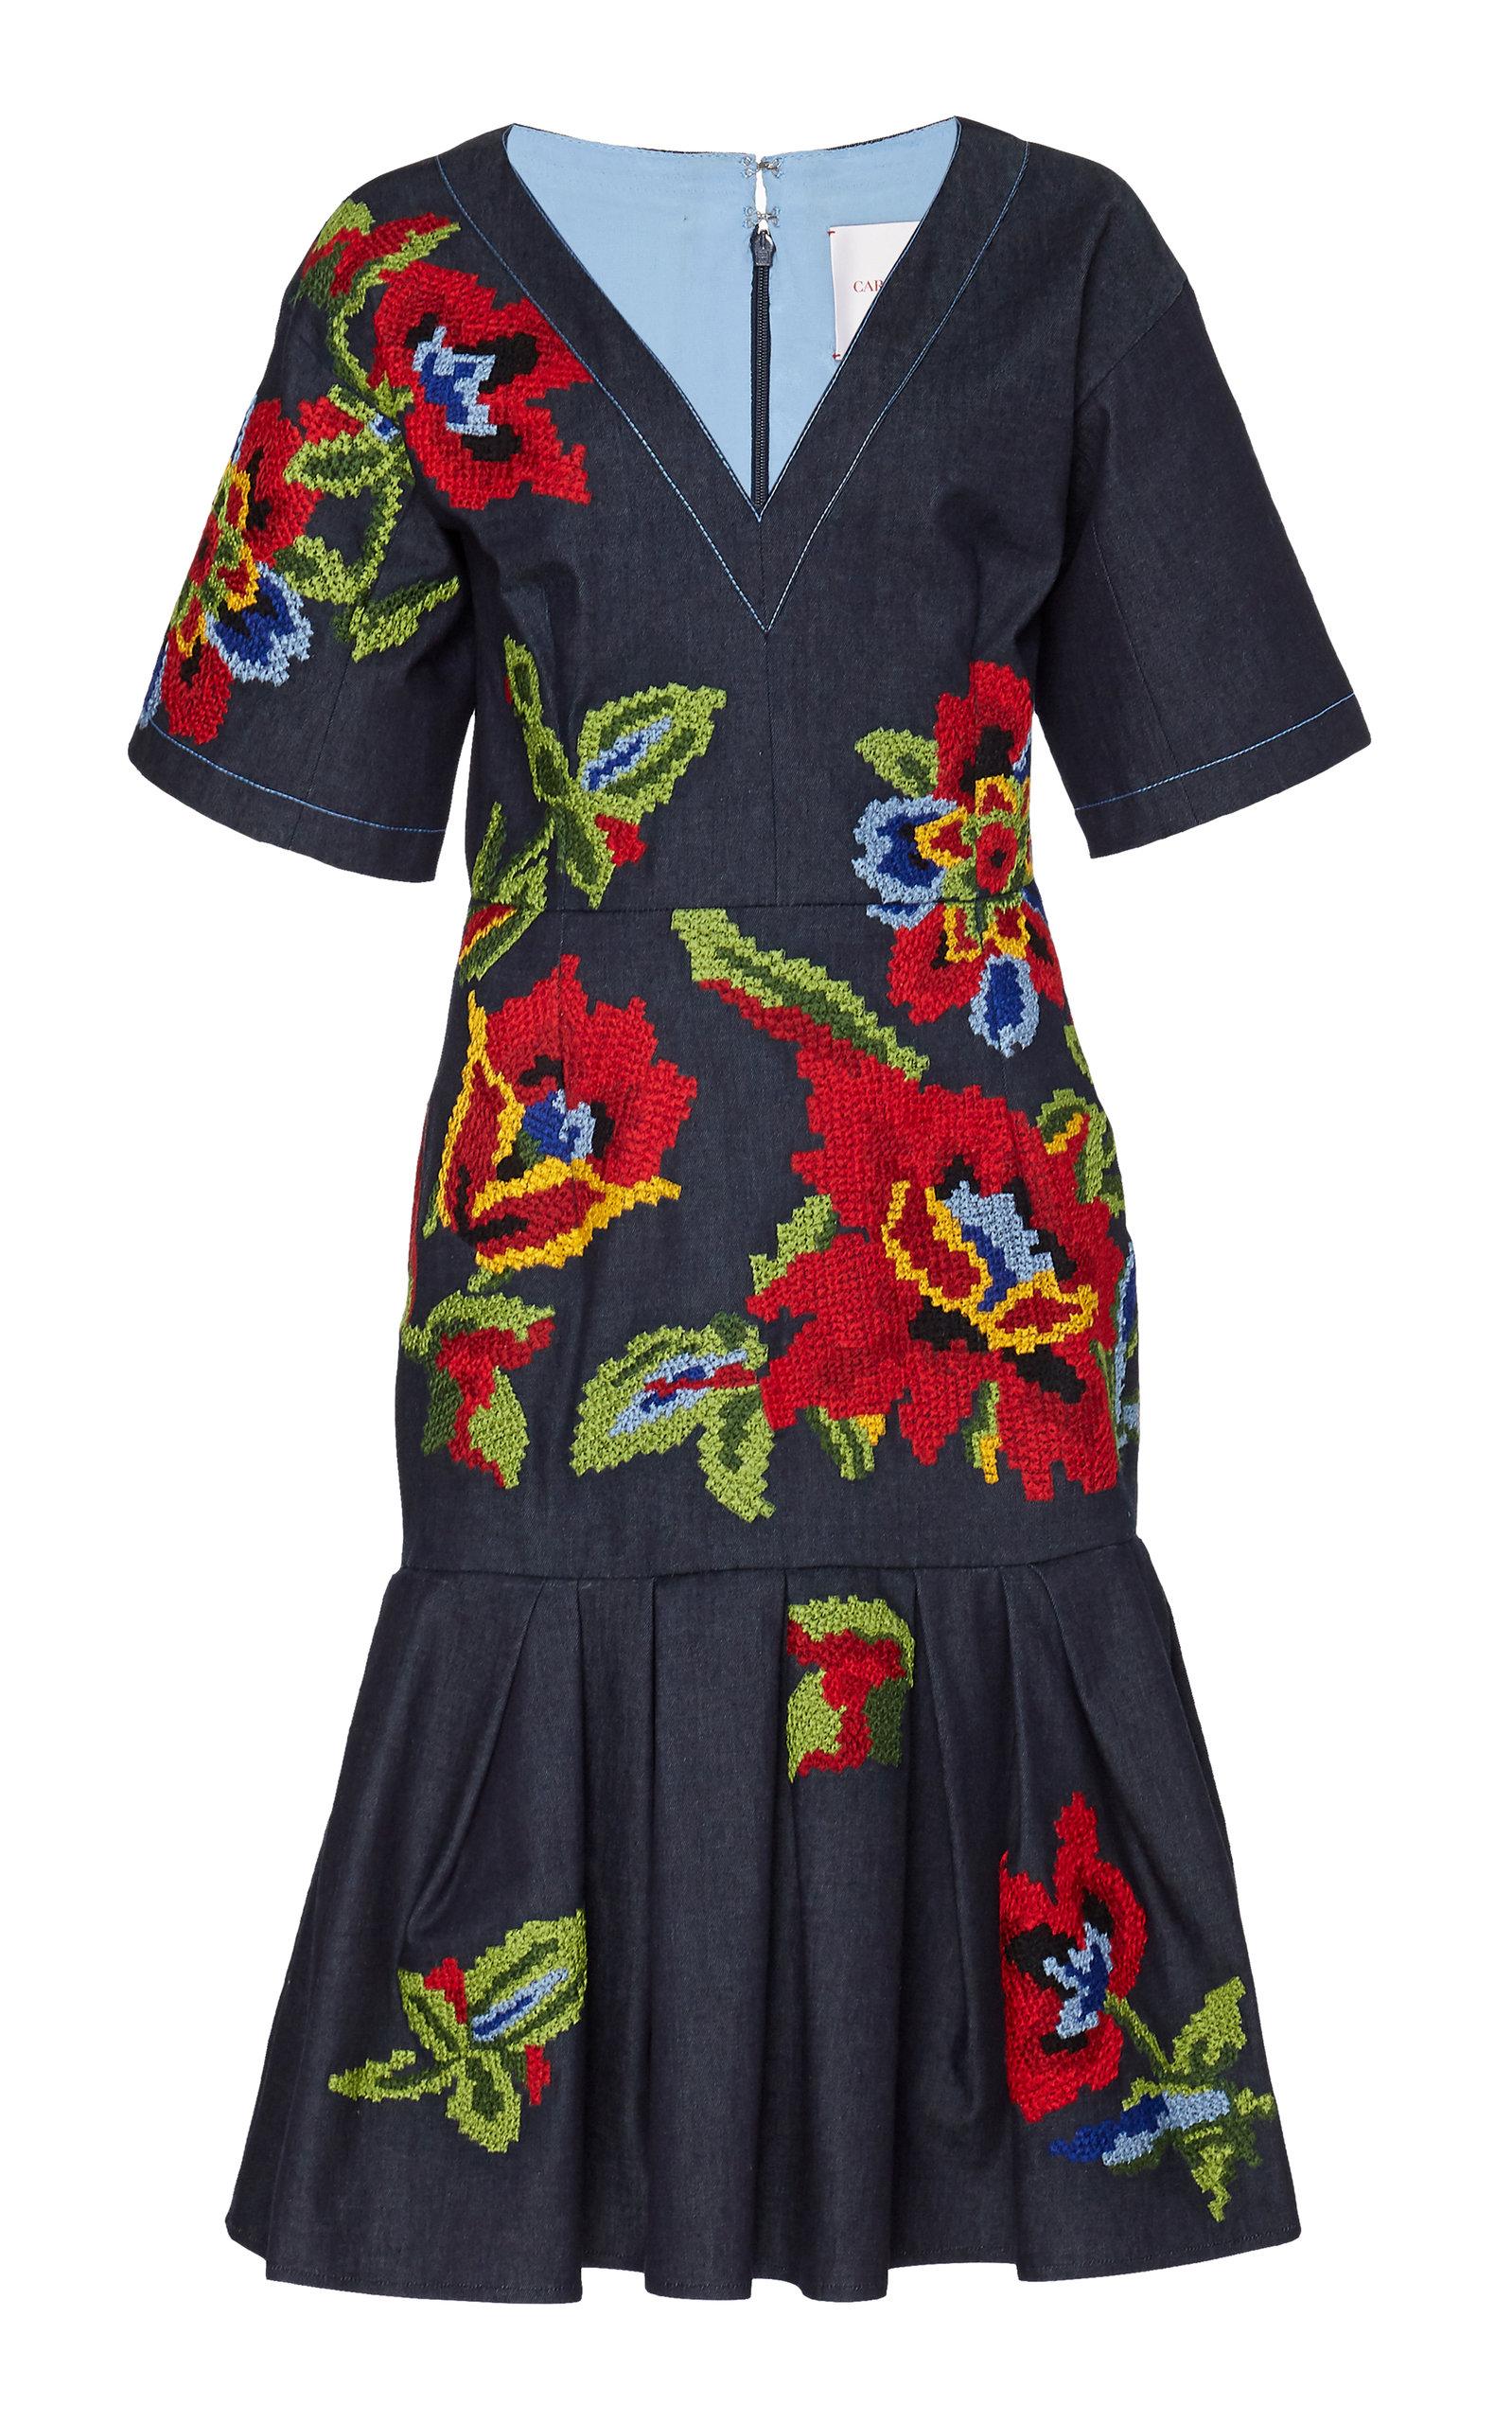 Buy Carolina Herrera Floral-Embroidered Stretch-Denim Dress online, shop Carolina Herrera at the best price